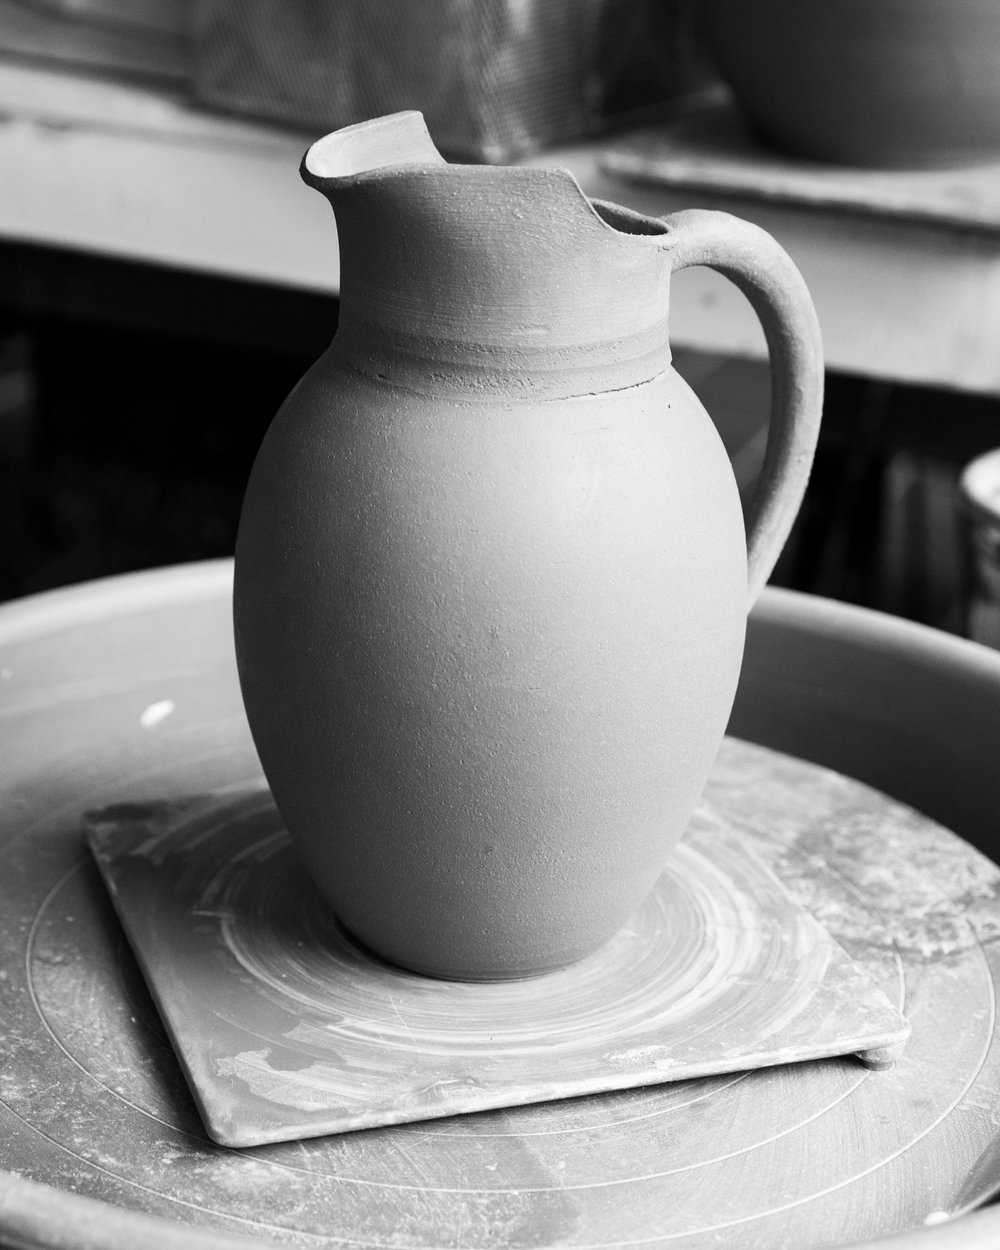 baibabaeva_ceramics1.jpg